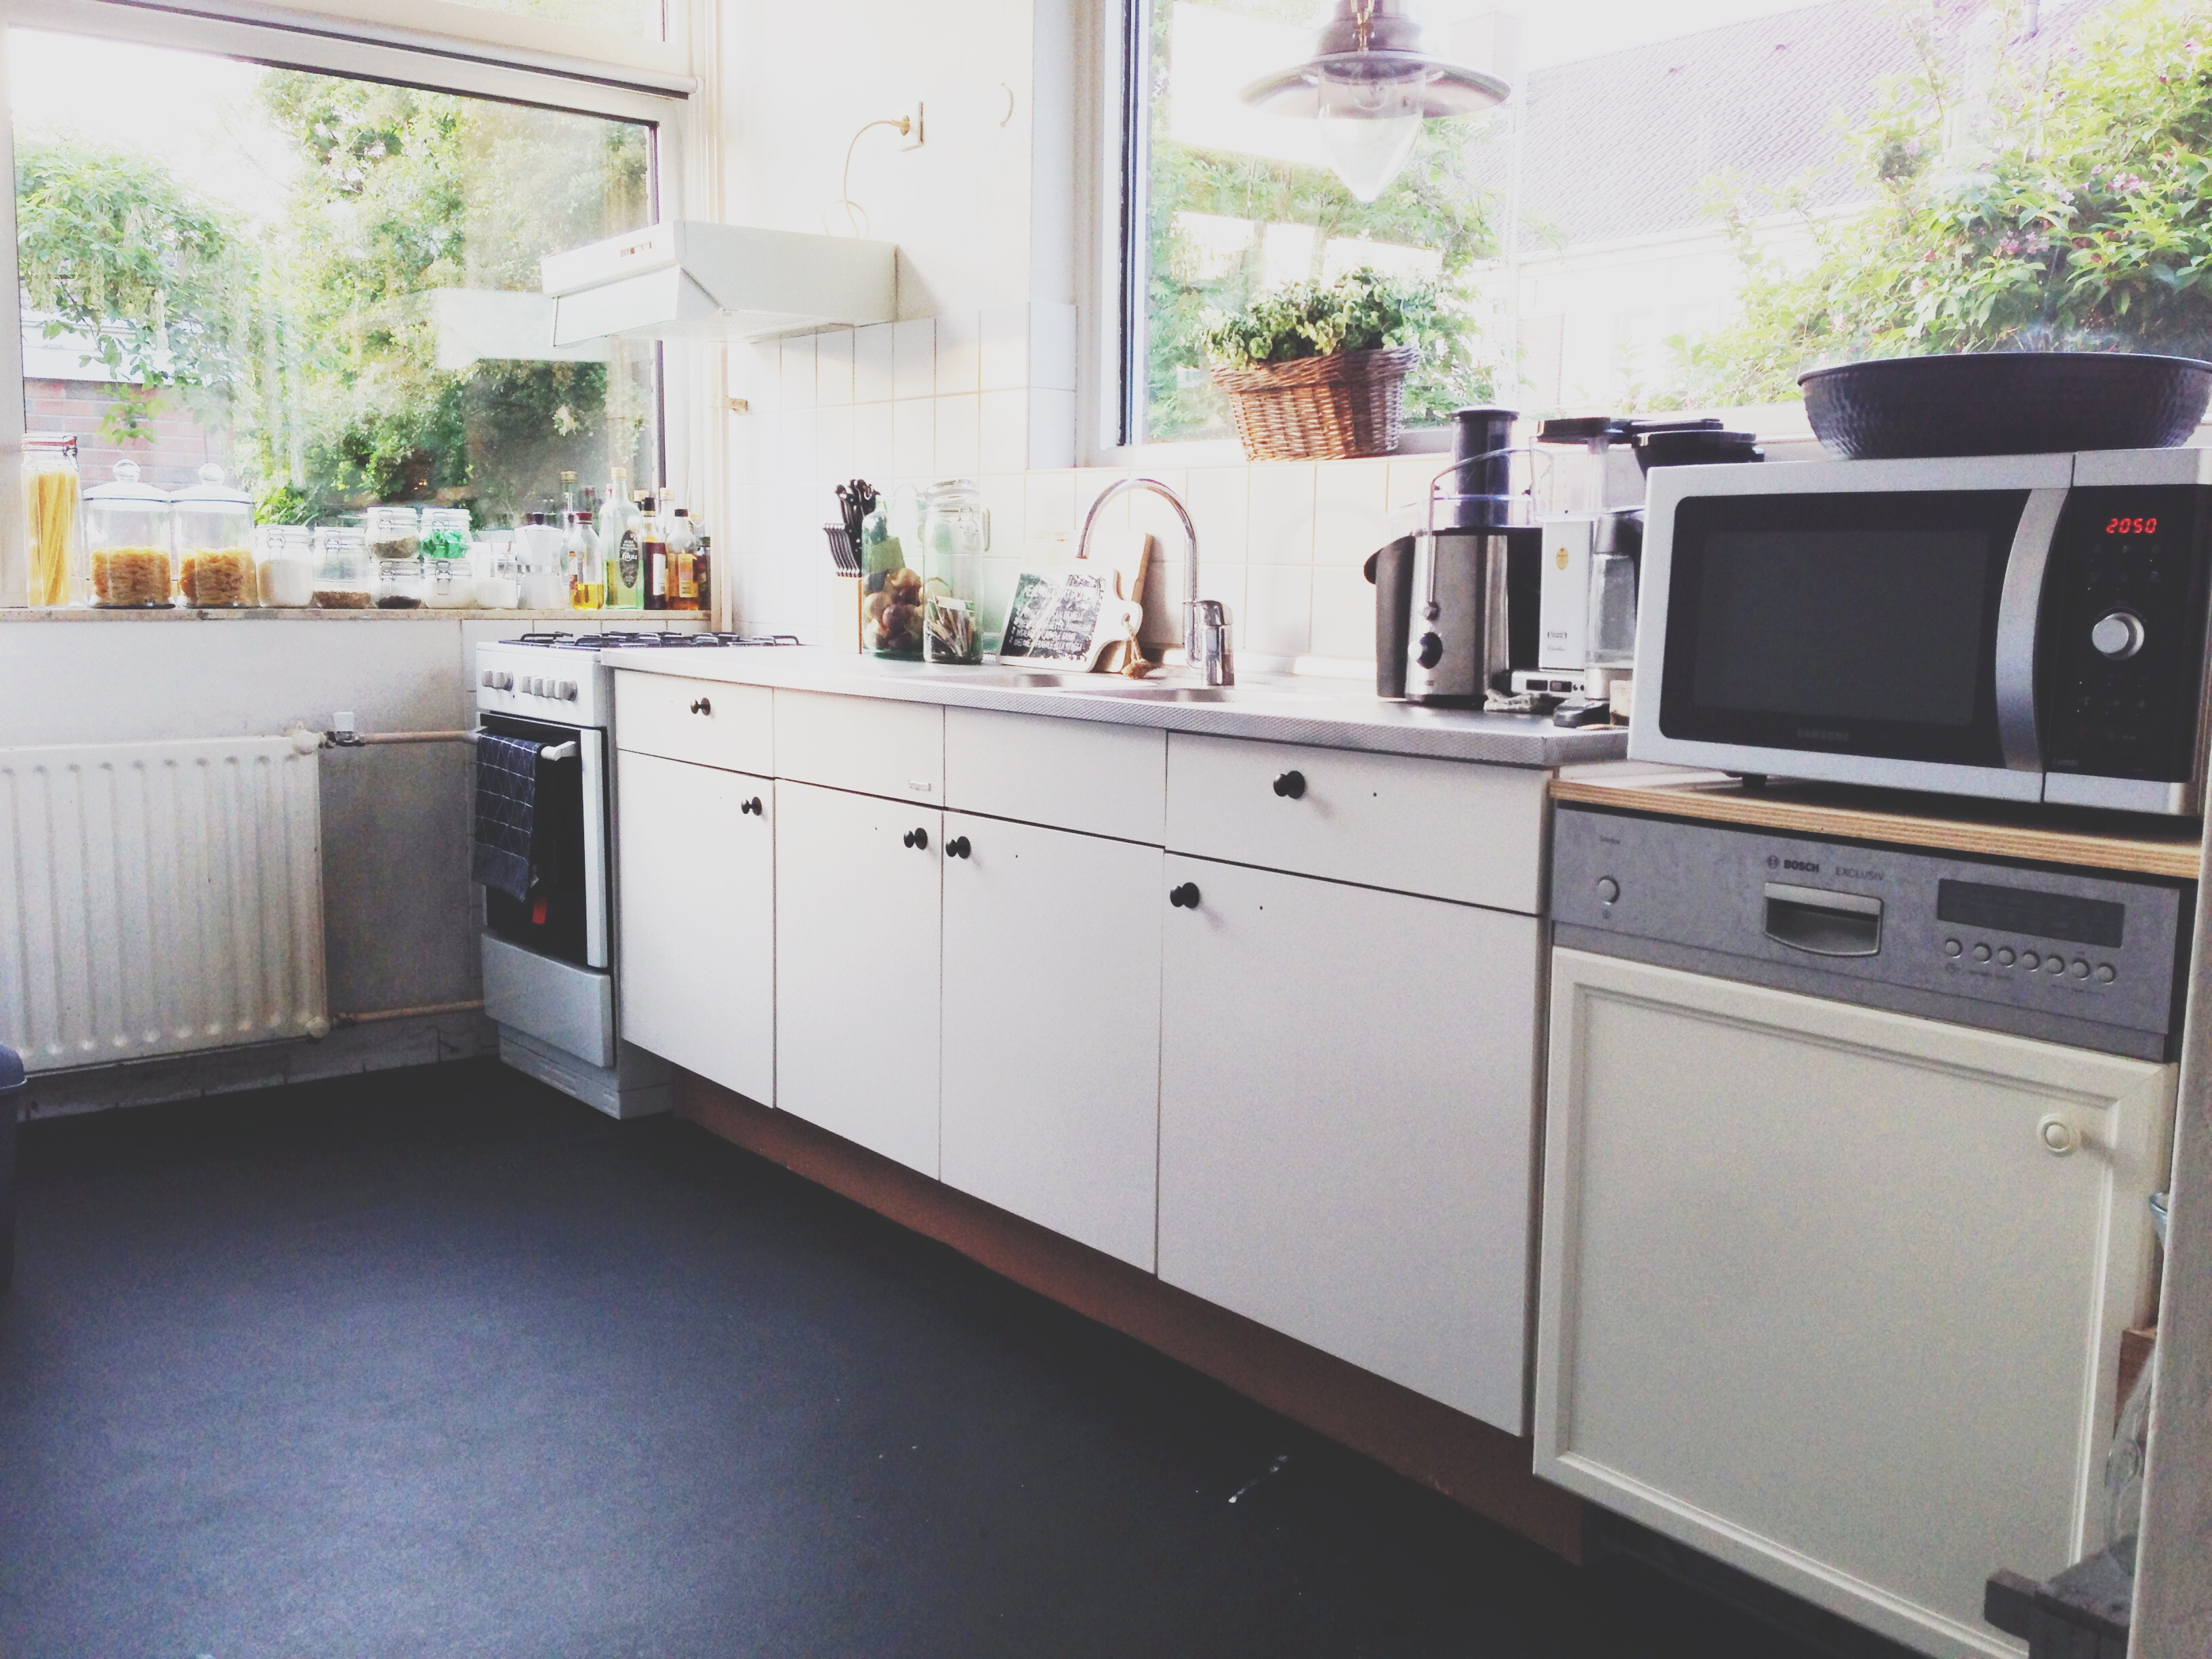 Vtwonen Keuken Inspiratie : Do it yourself en stylingtips: keuken – donebymyself